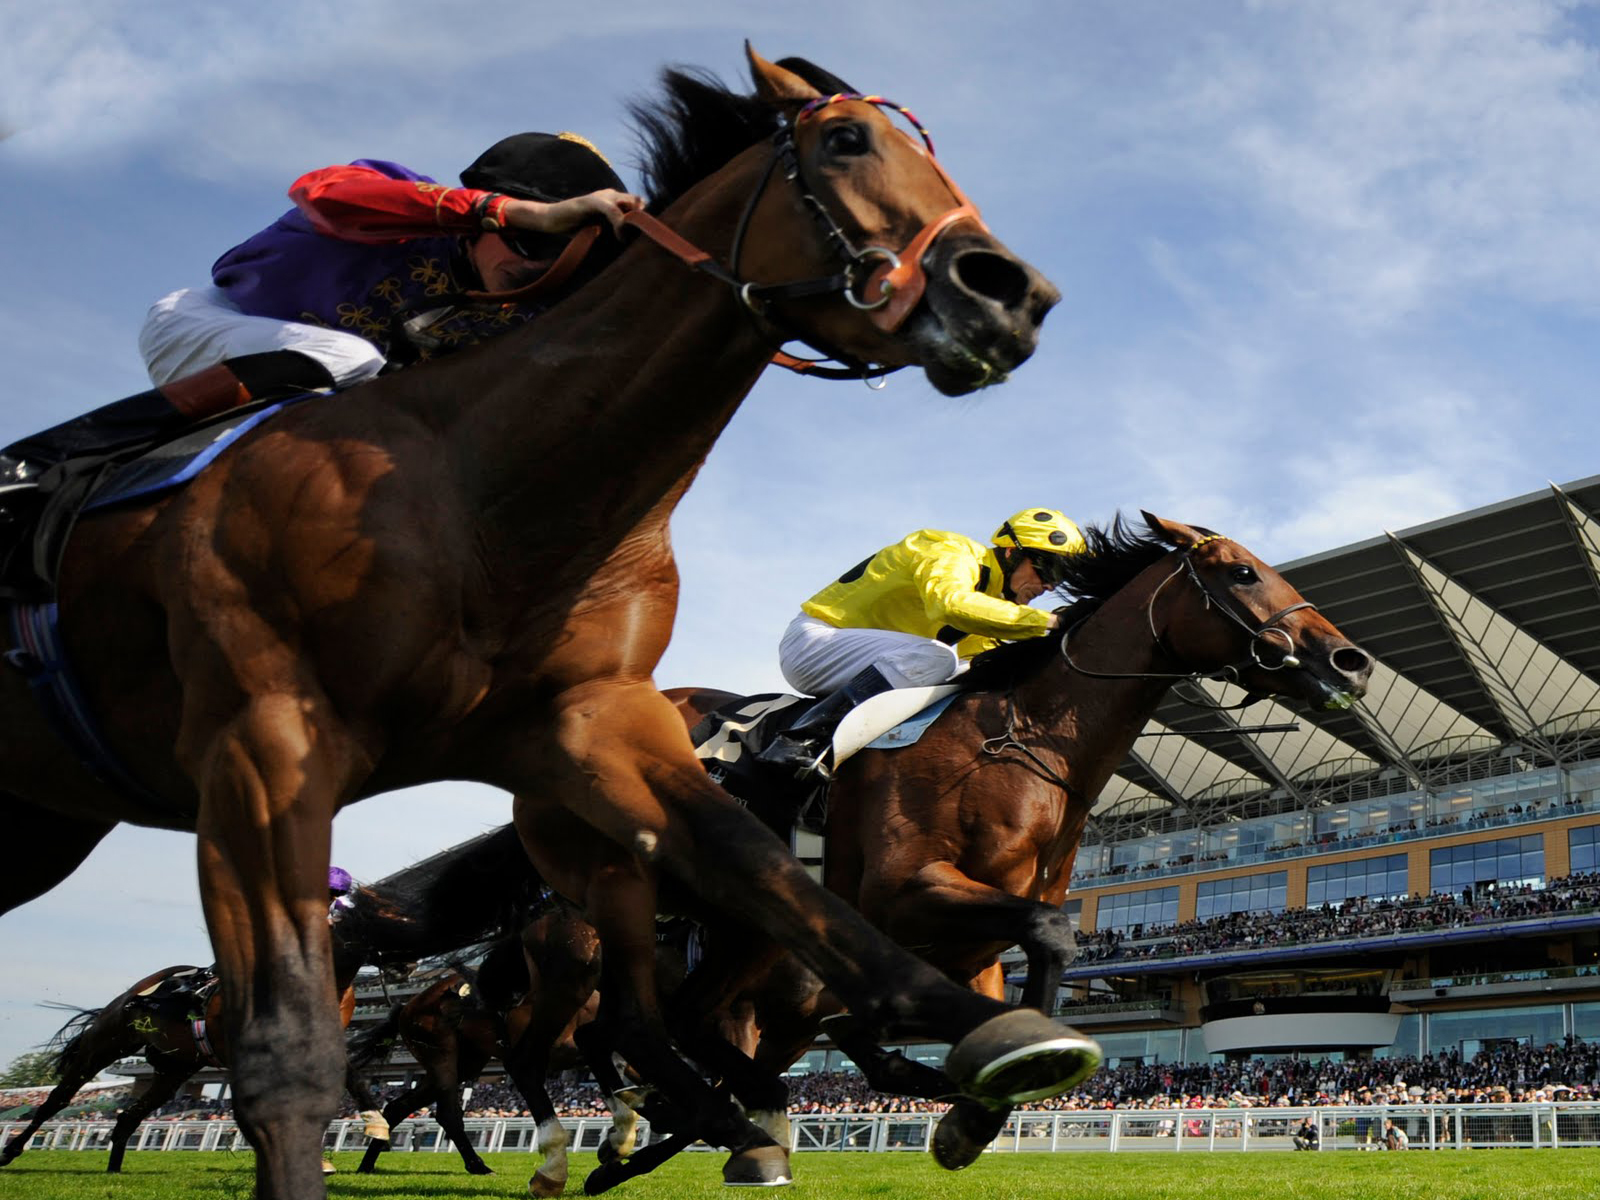 Royalty Free Horse Racing - 1600x1200 - Download HD Wallpaper - WallpaperTip